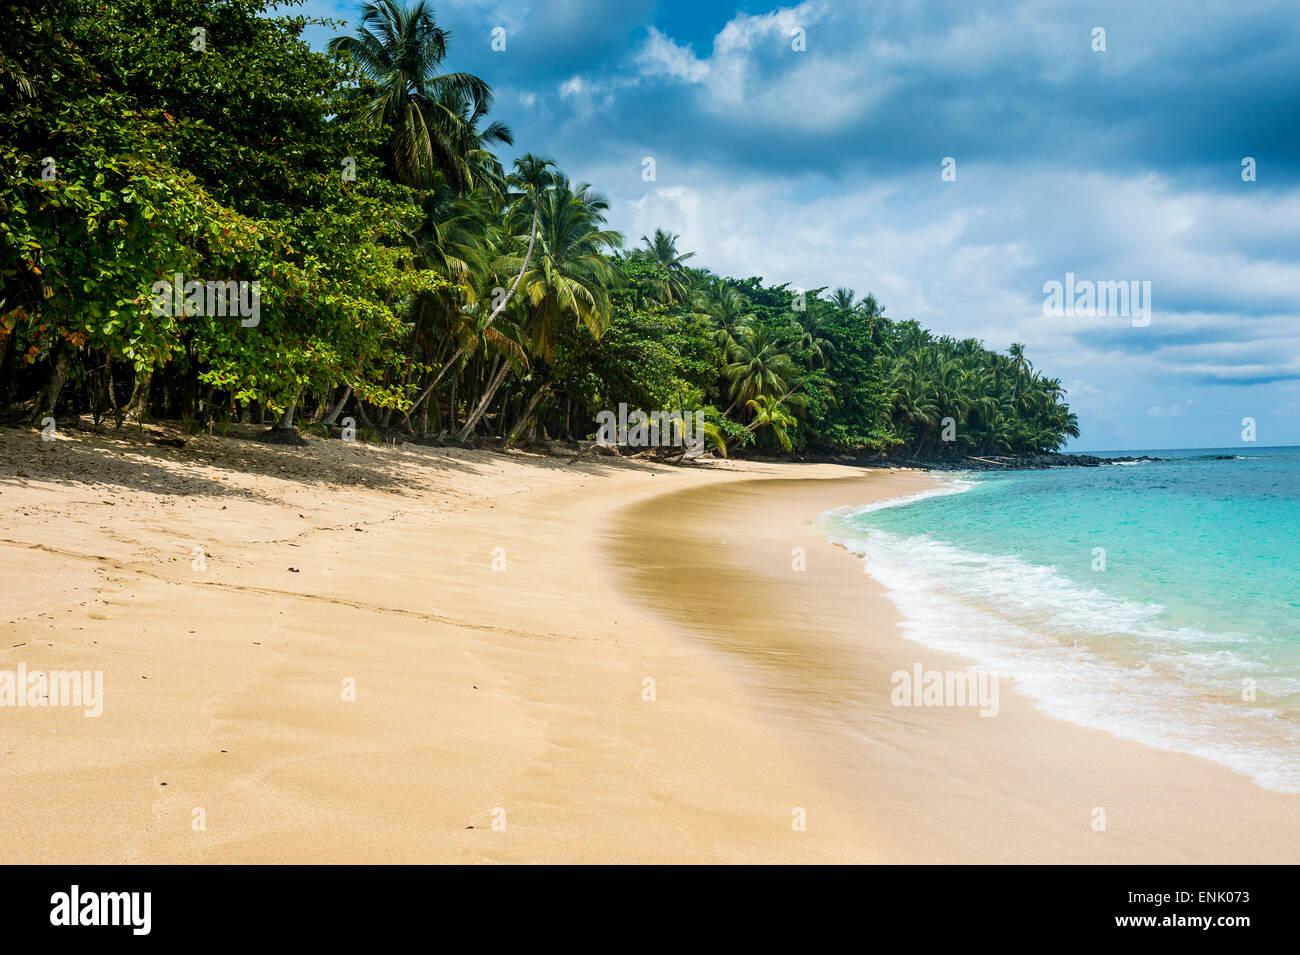 Banana Beach, UNESCO-Biosphärenreservat, Principe, Sao Tome und Principe, Atlantik, Afrika Stockbild